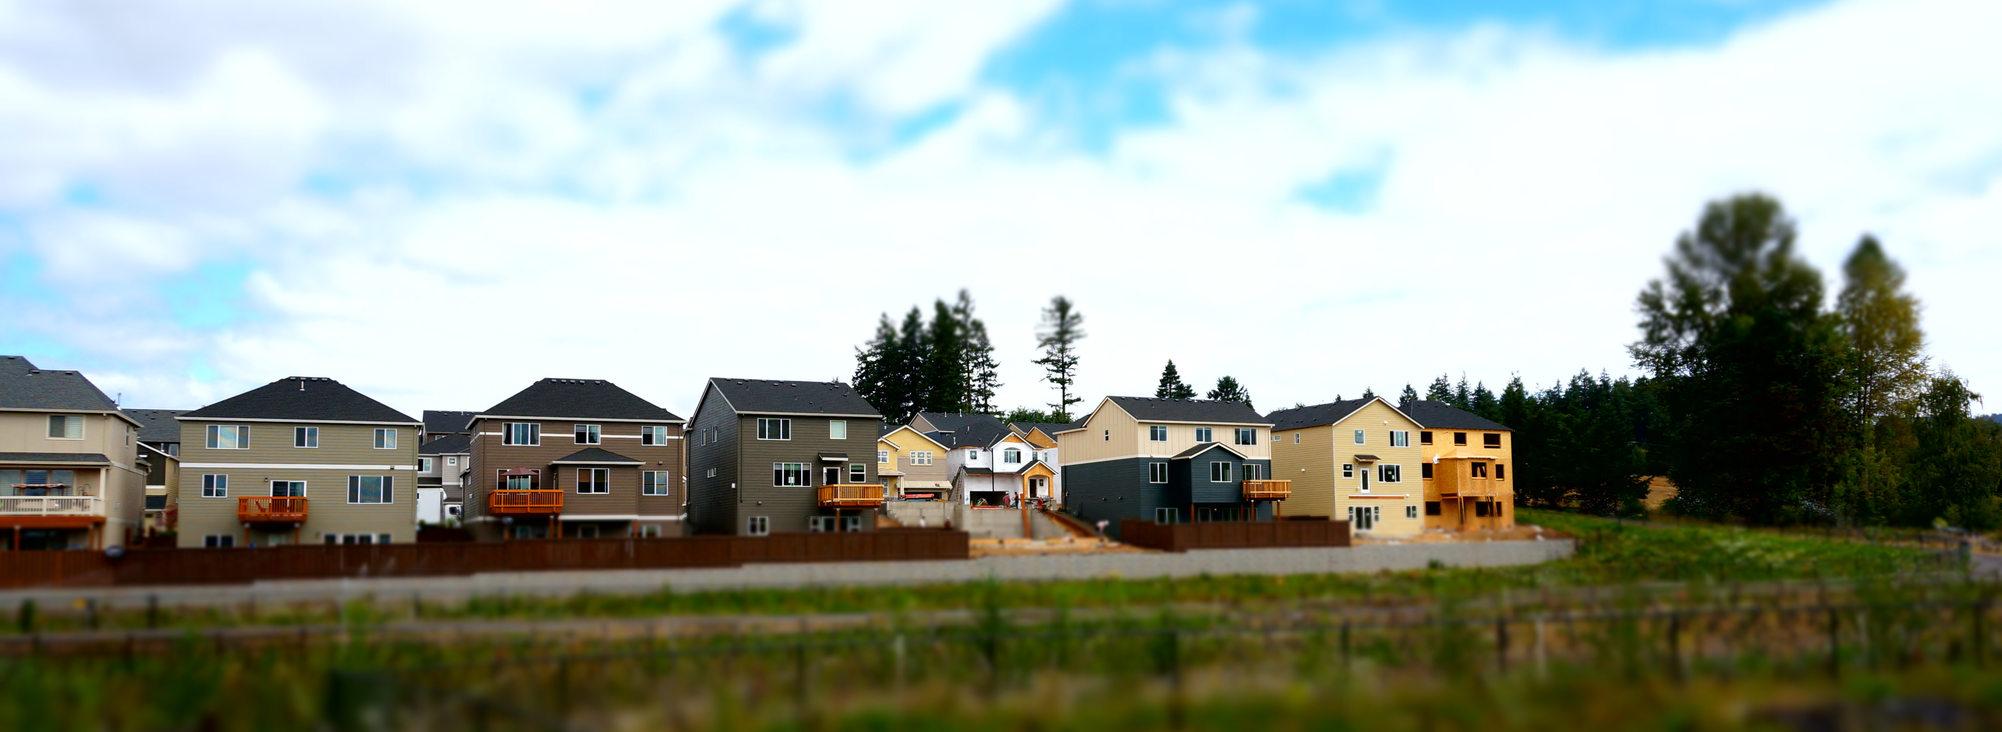 New houses beside a wetland wide